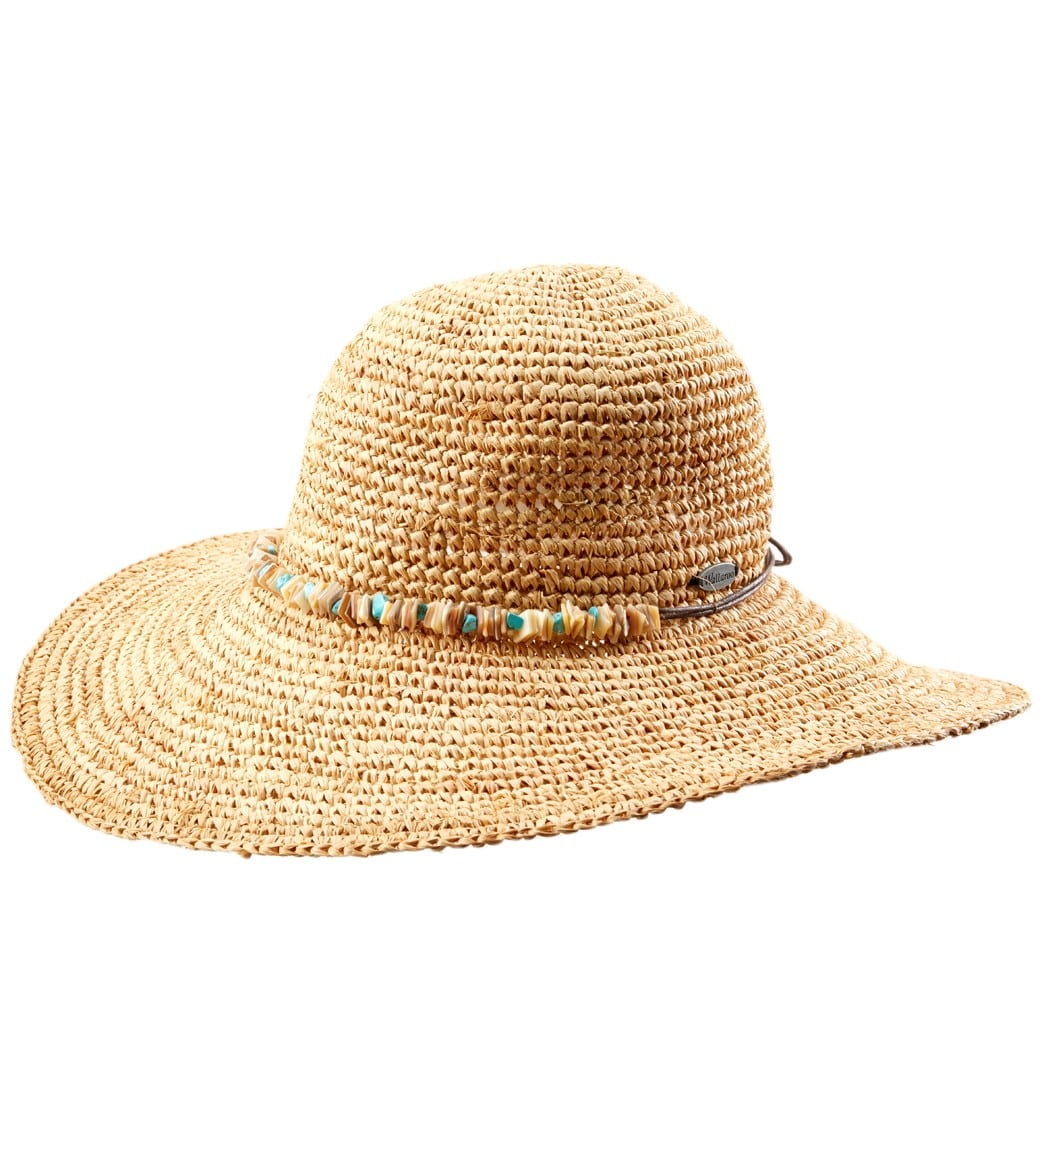 6e300807f7a Wallaroo Women s Sabrina Sun Hat at SwimOutlet.com - Free Shipping